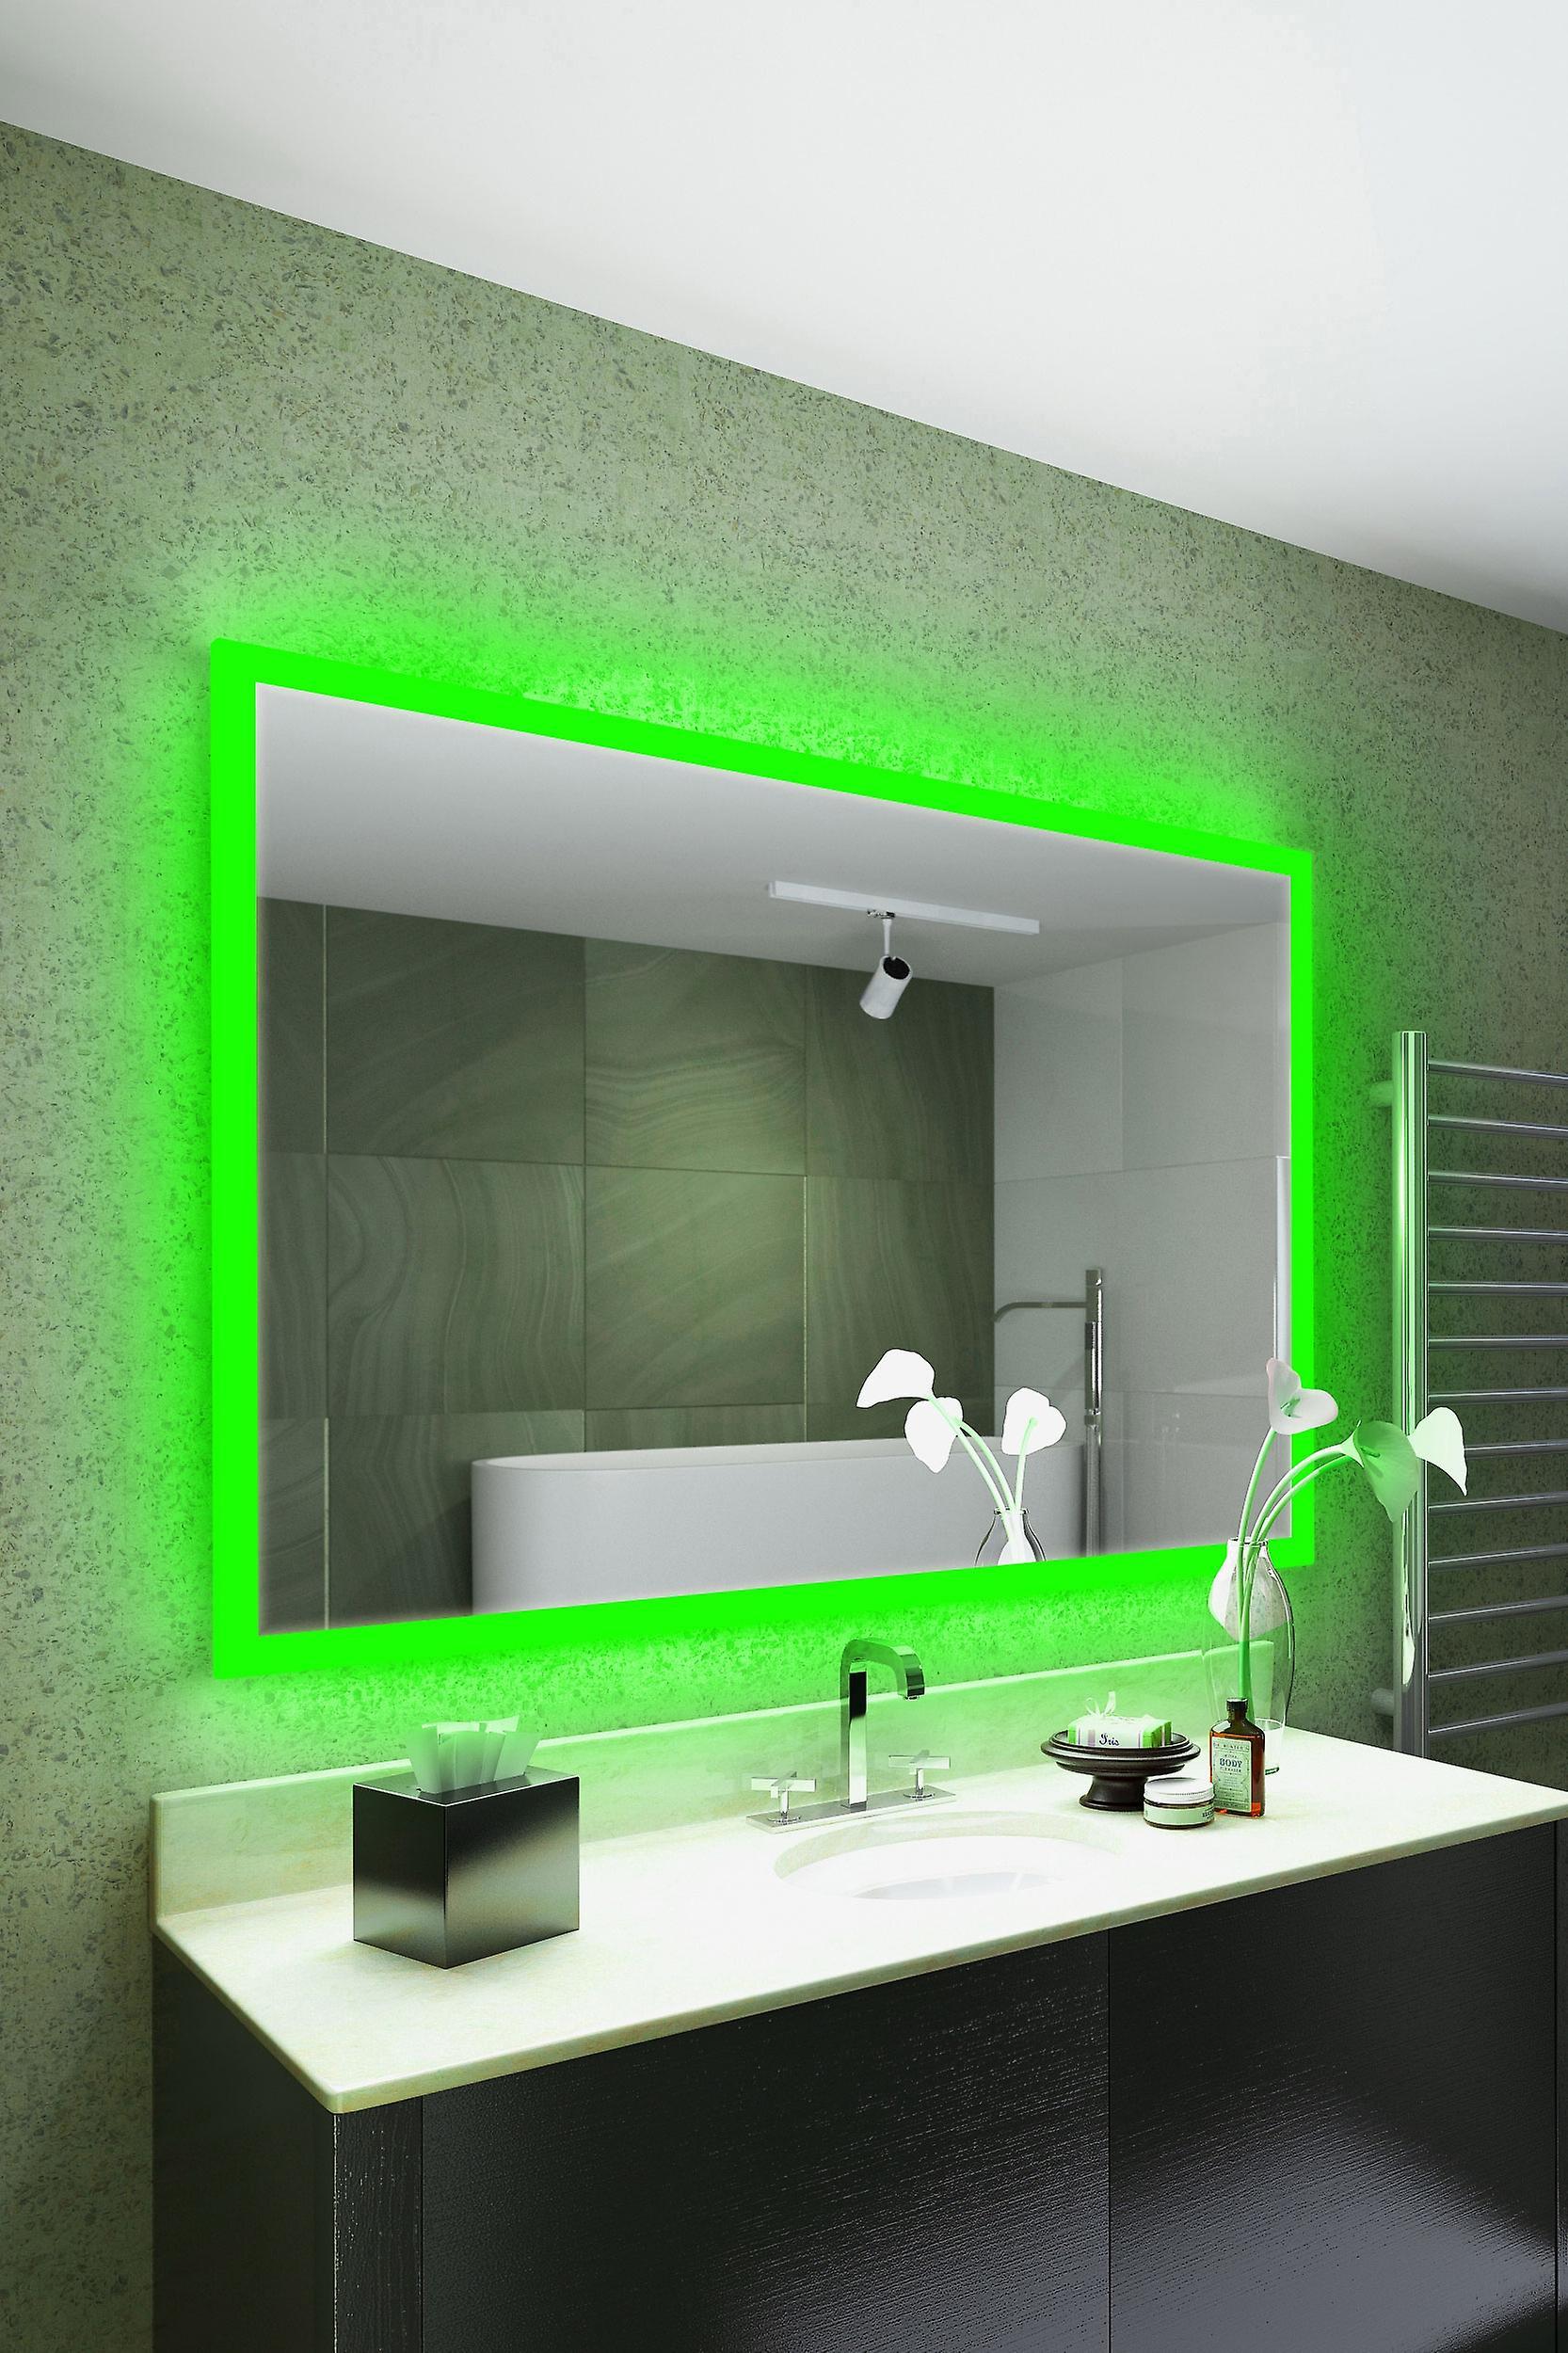 RGB Audio Shaver Mirror with Bluetooth Demist Sensor K8402hrgbaud